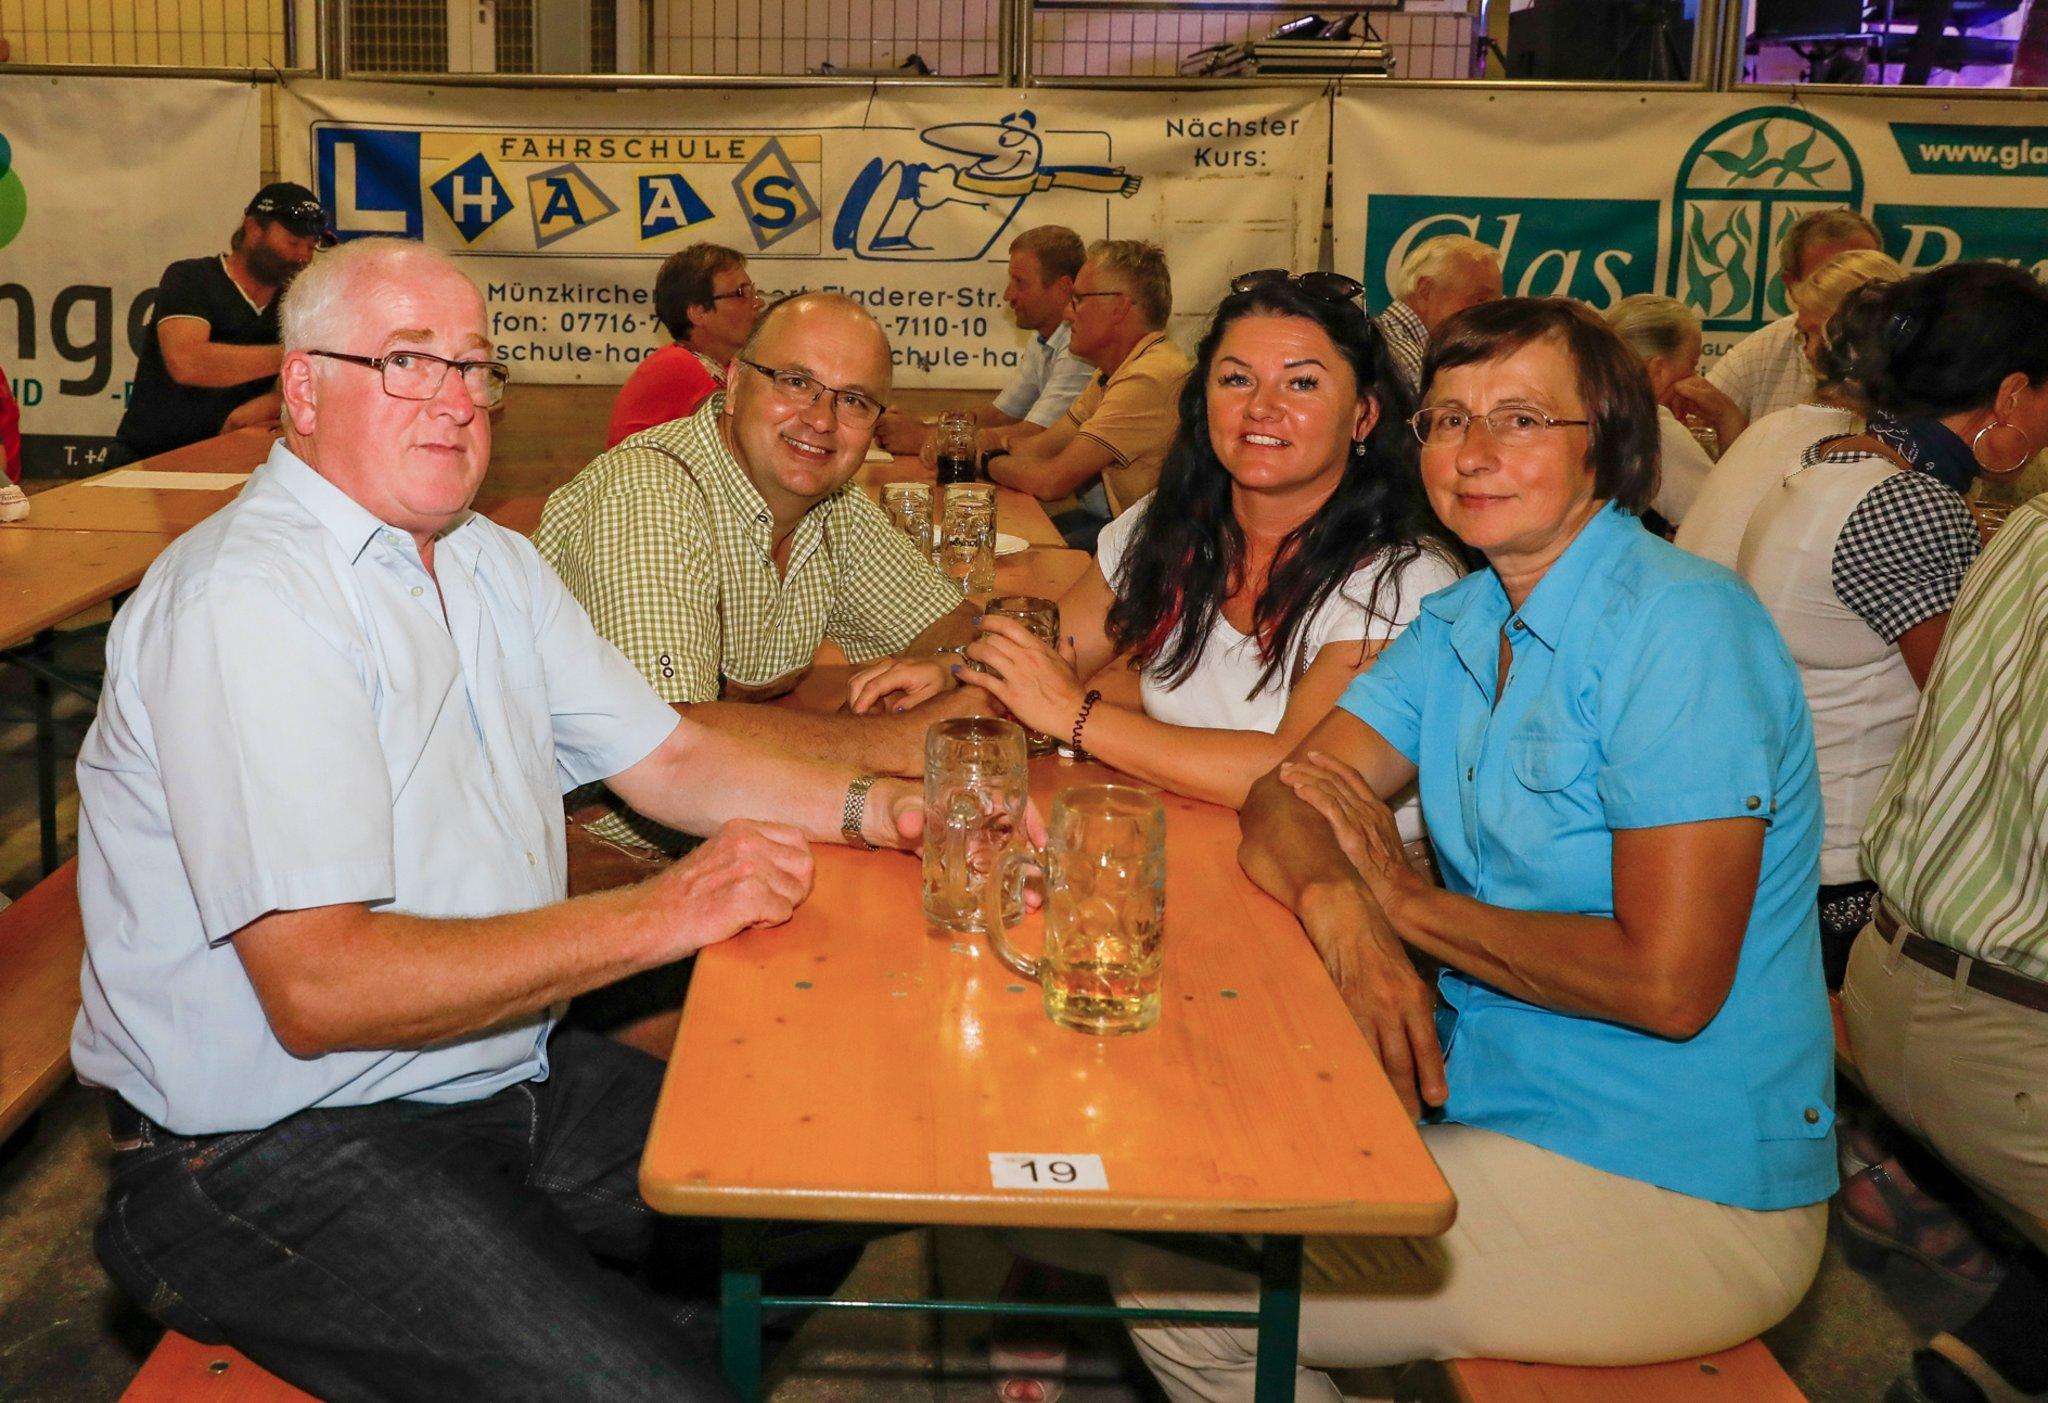 Sankt martin kurse fr singles, Single event mank